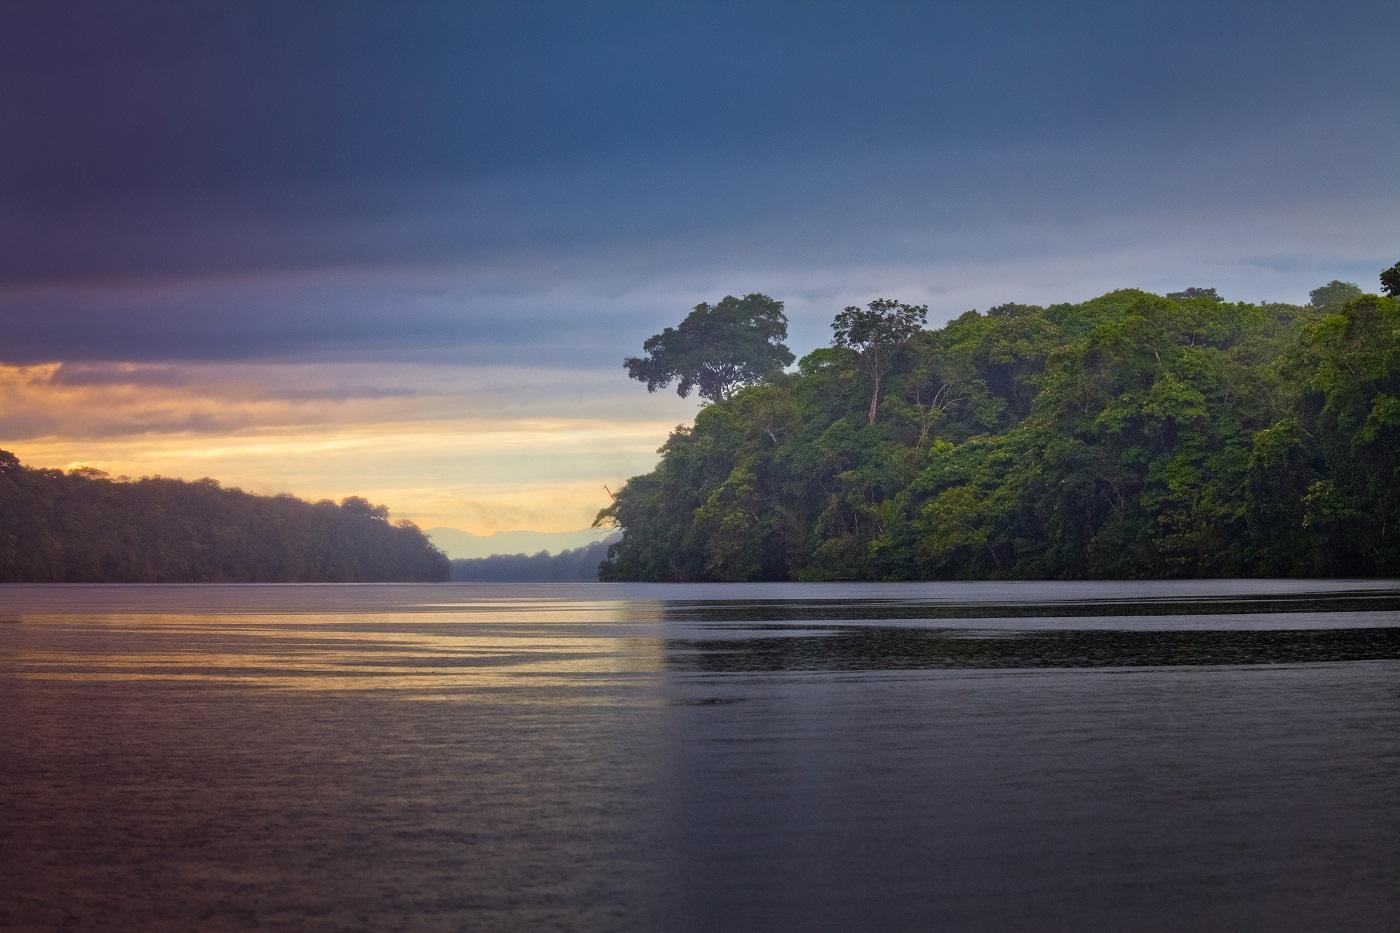 Landscape in Tortuguero National Park, Costa Rica